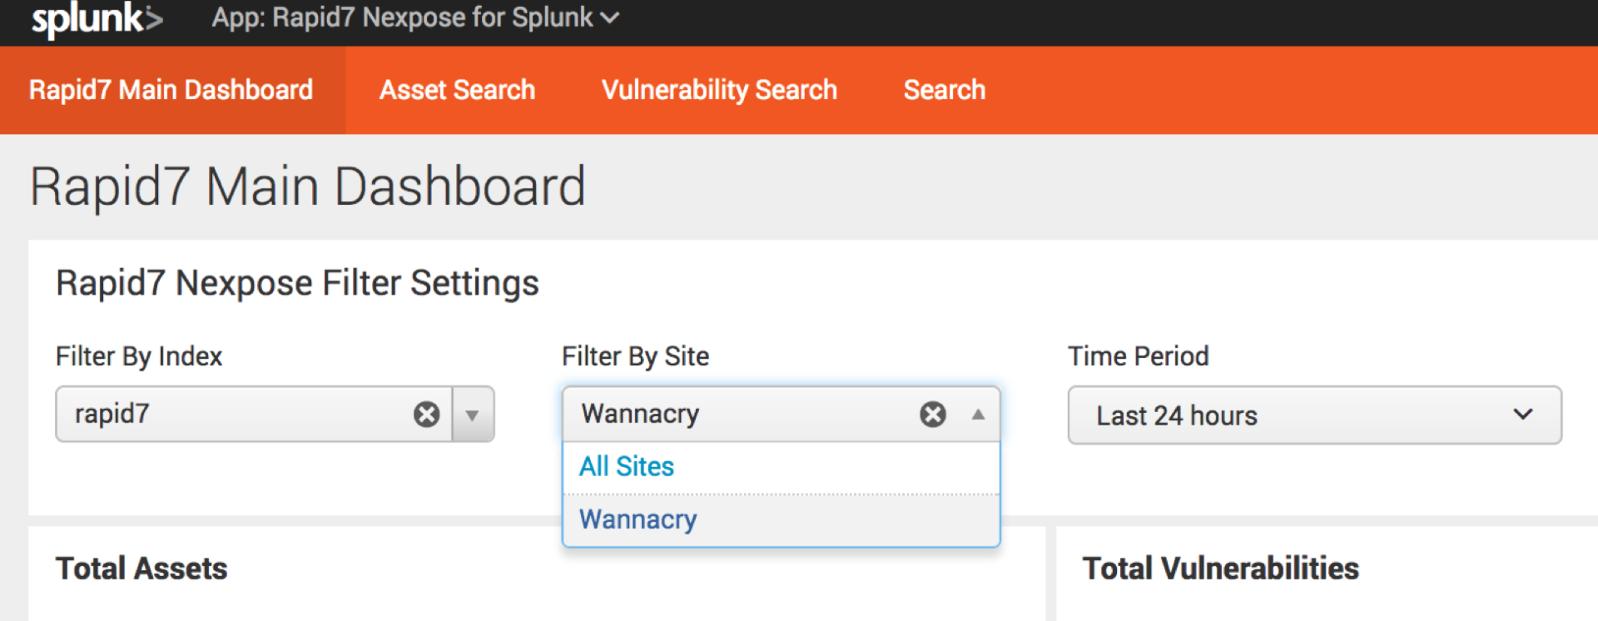 WannaCry Vulnerabilities in Splunk? InsightVM Splunk Integration